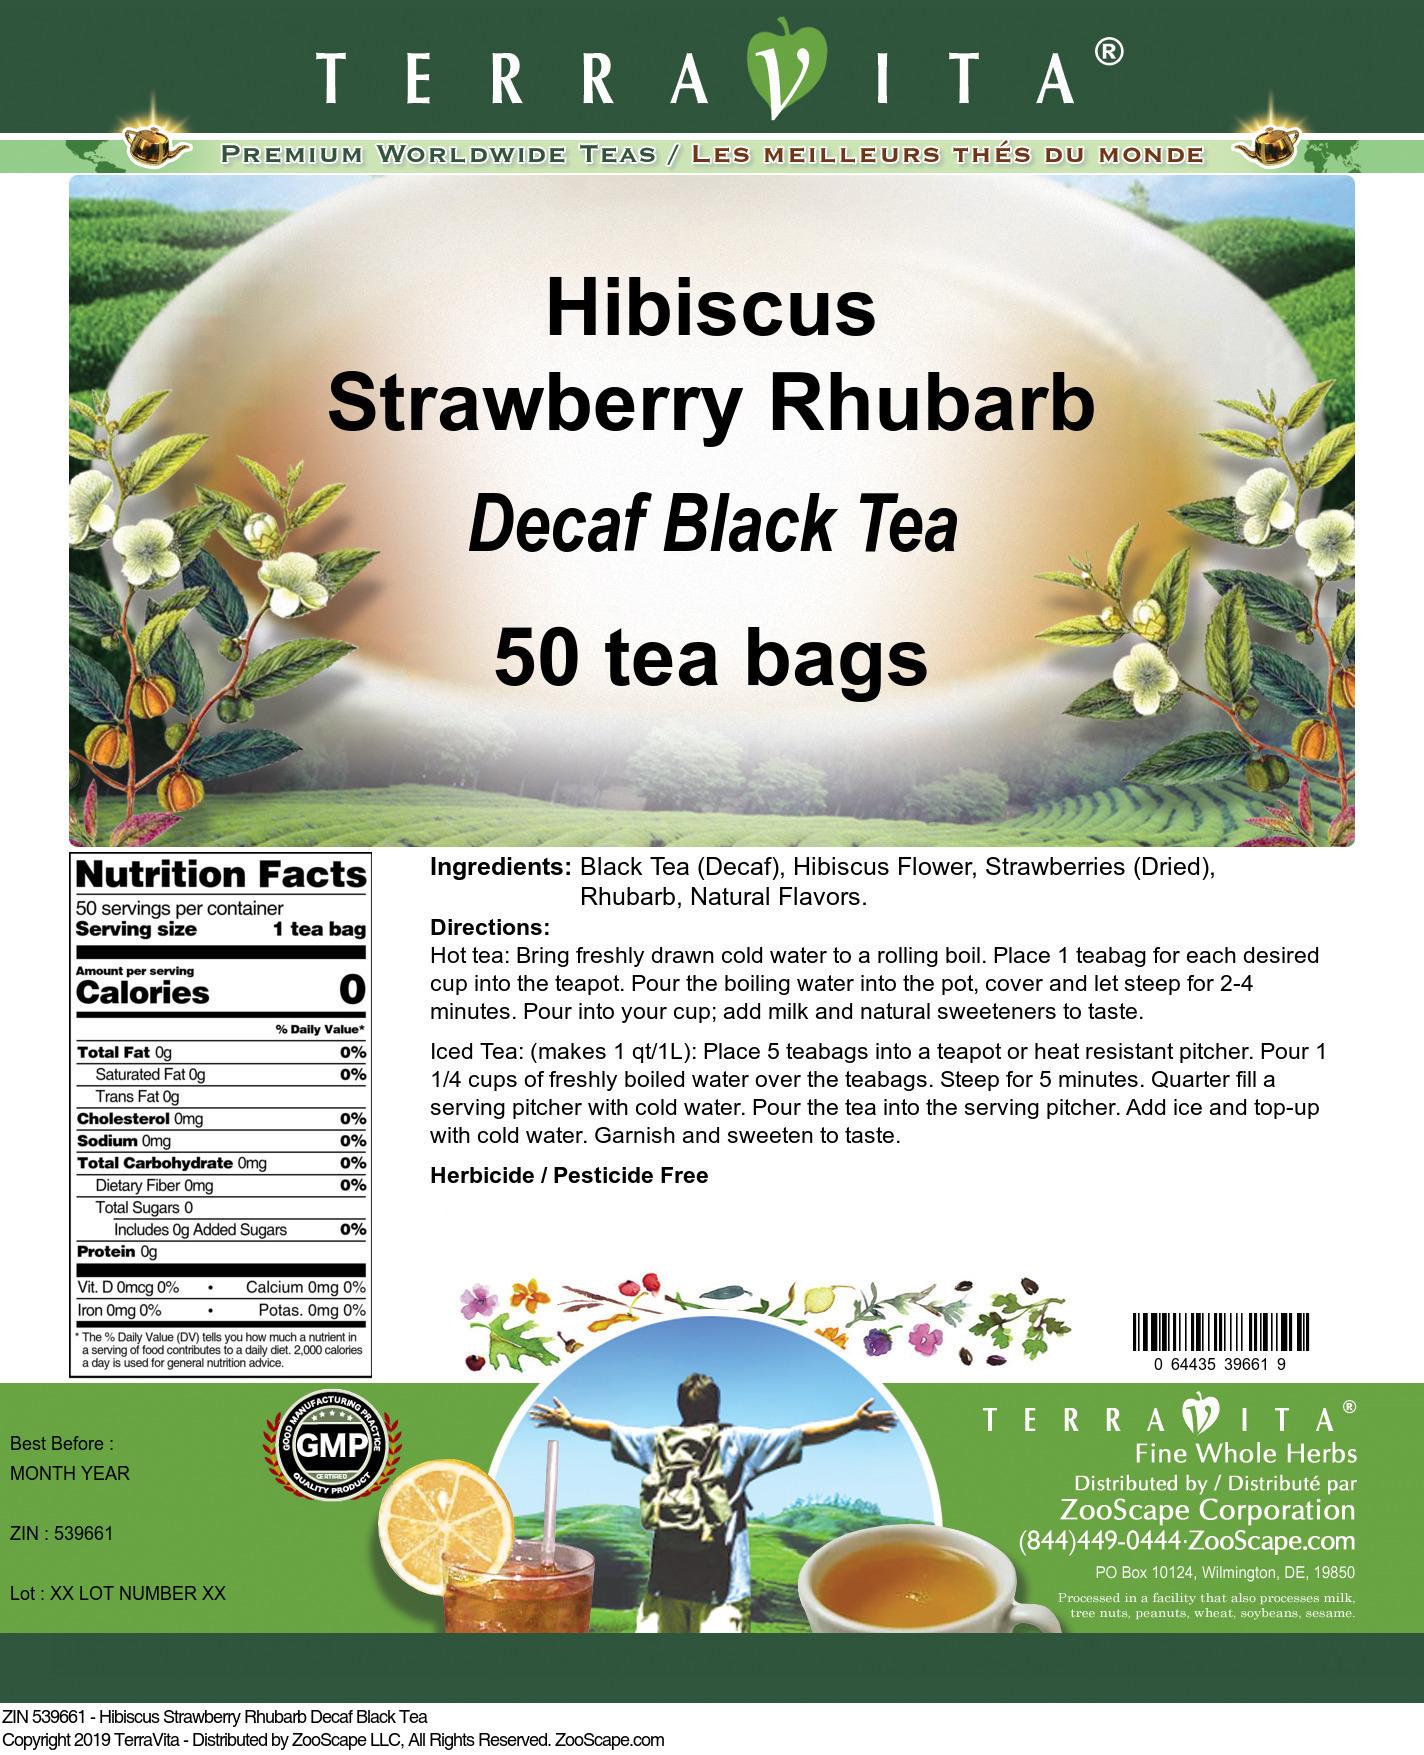 Hibiscus Strawberry Rhubarb Decaf Black Tea